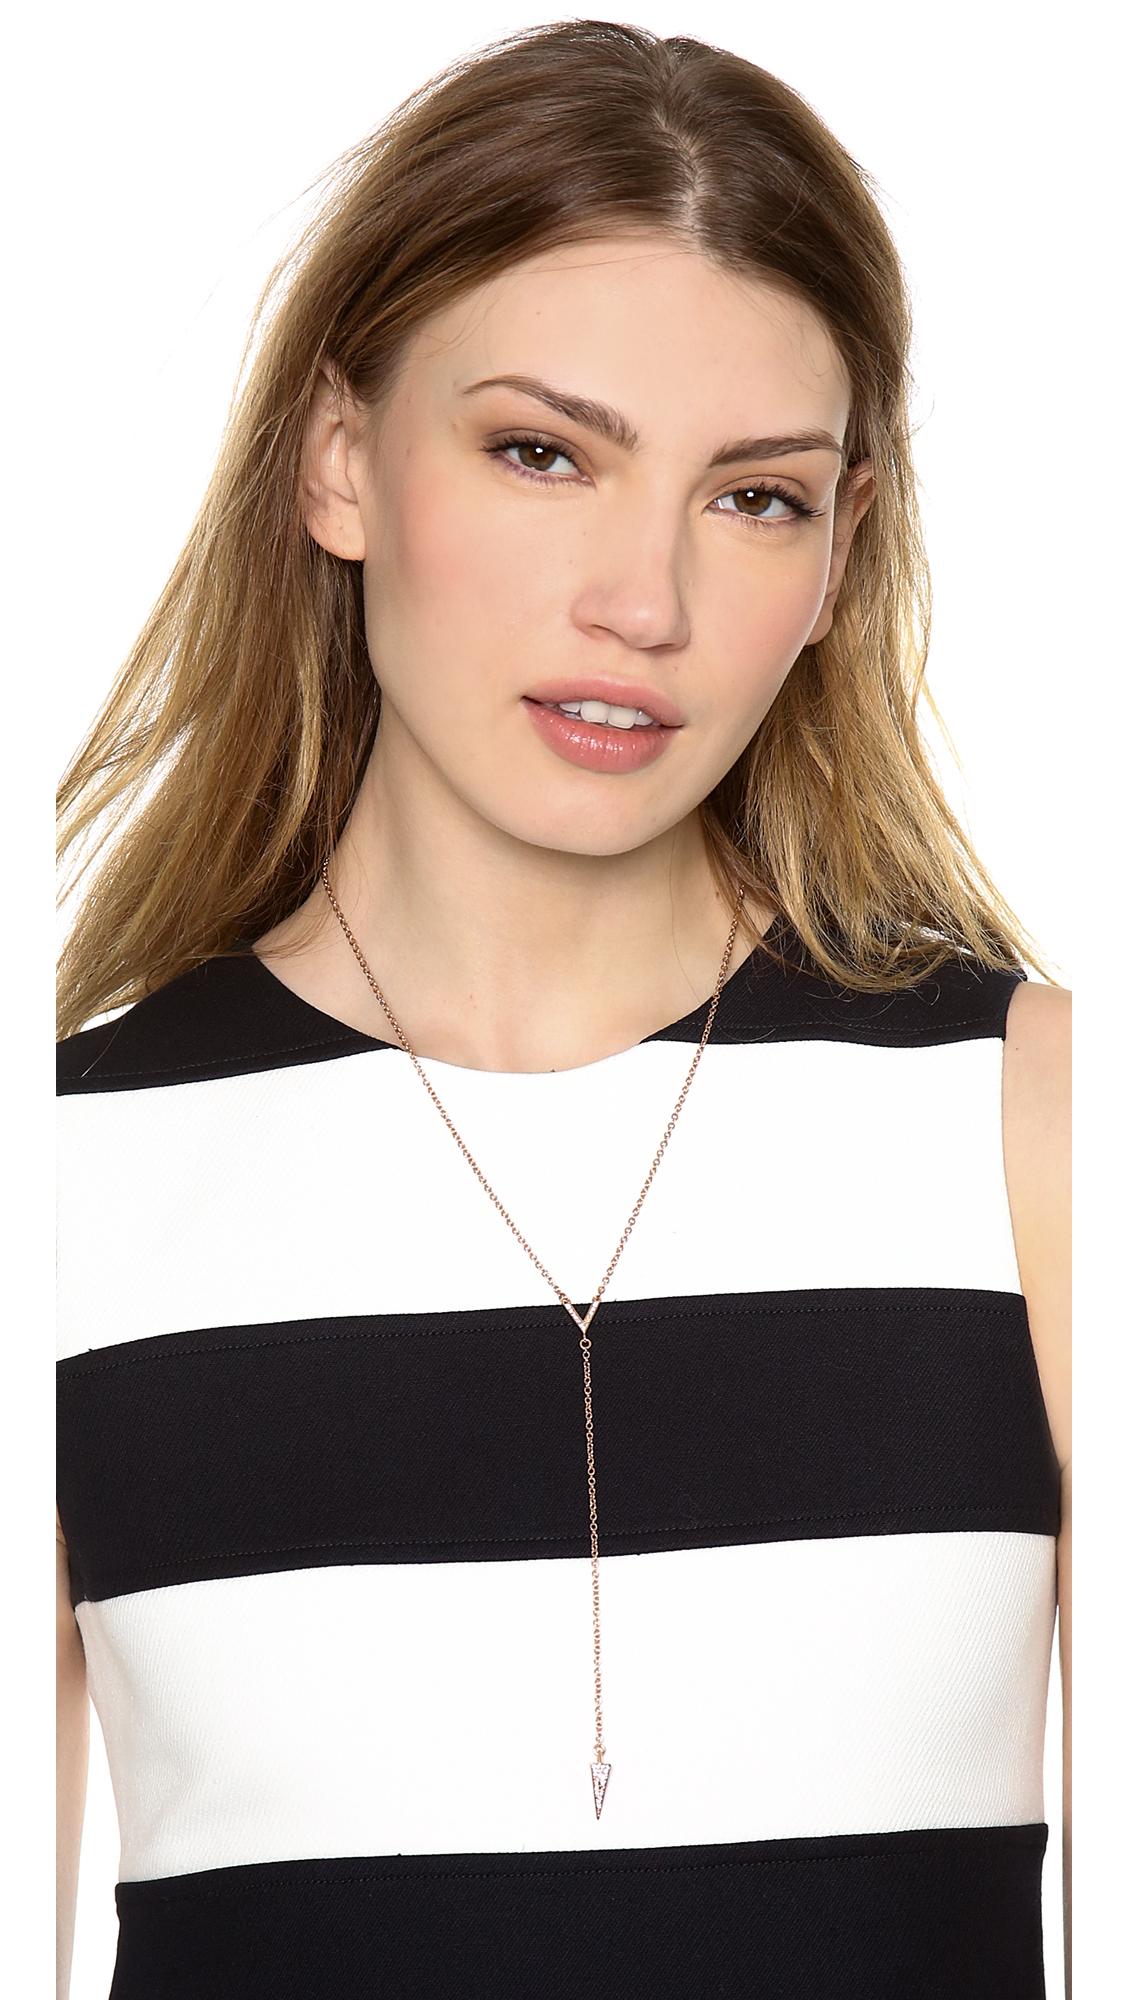 Lyst - Rebecca Minkoff Y Necklace in Metallic